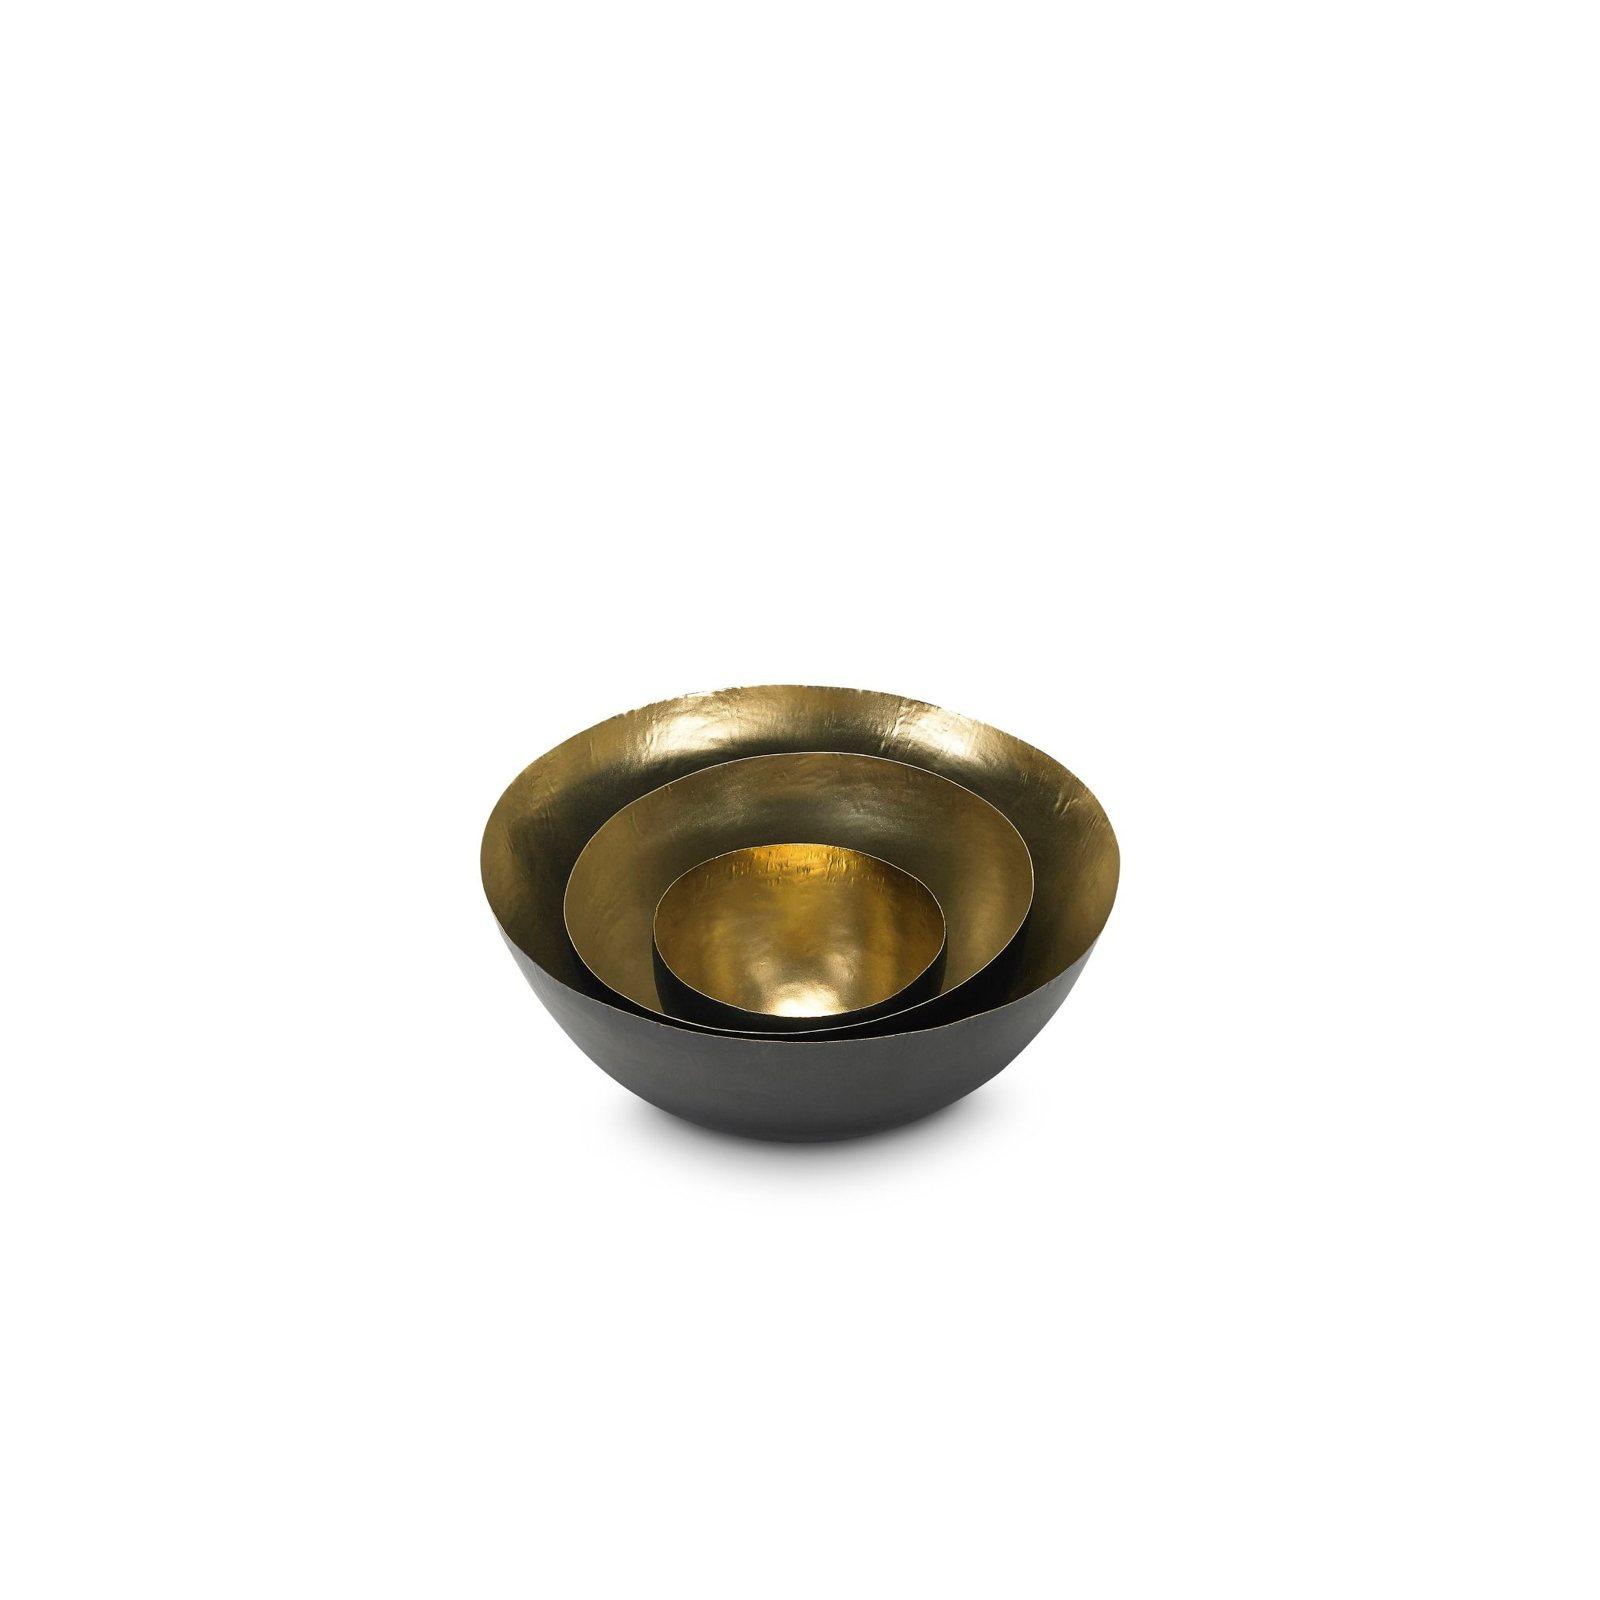 Form Bowl Deep Set Small Black Amp Brass By Tom Dixon Up